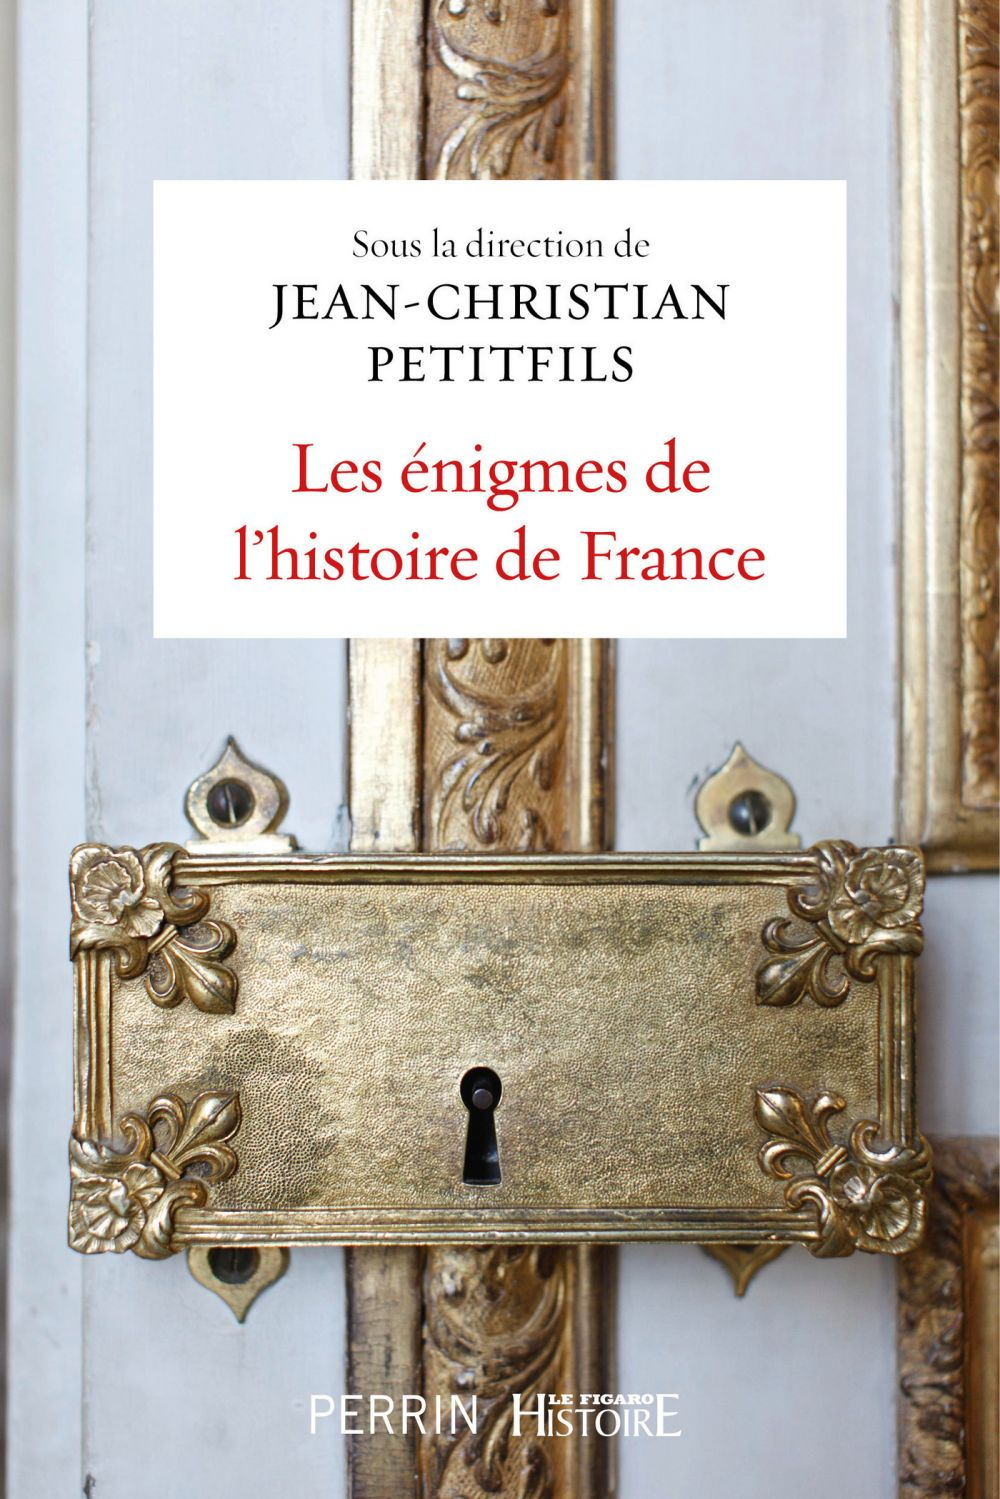 Les énigmes de l'histoire de France   Petitfils, Jean-Christian